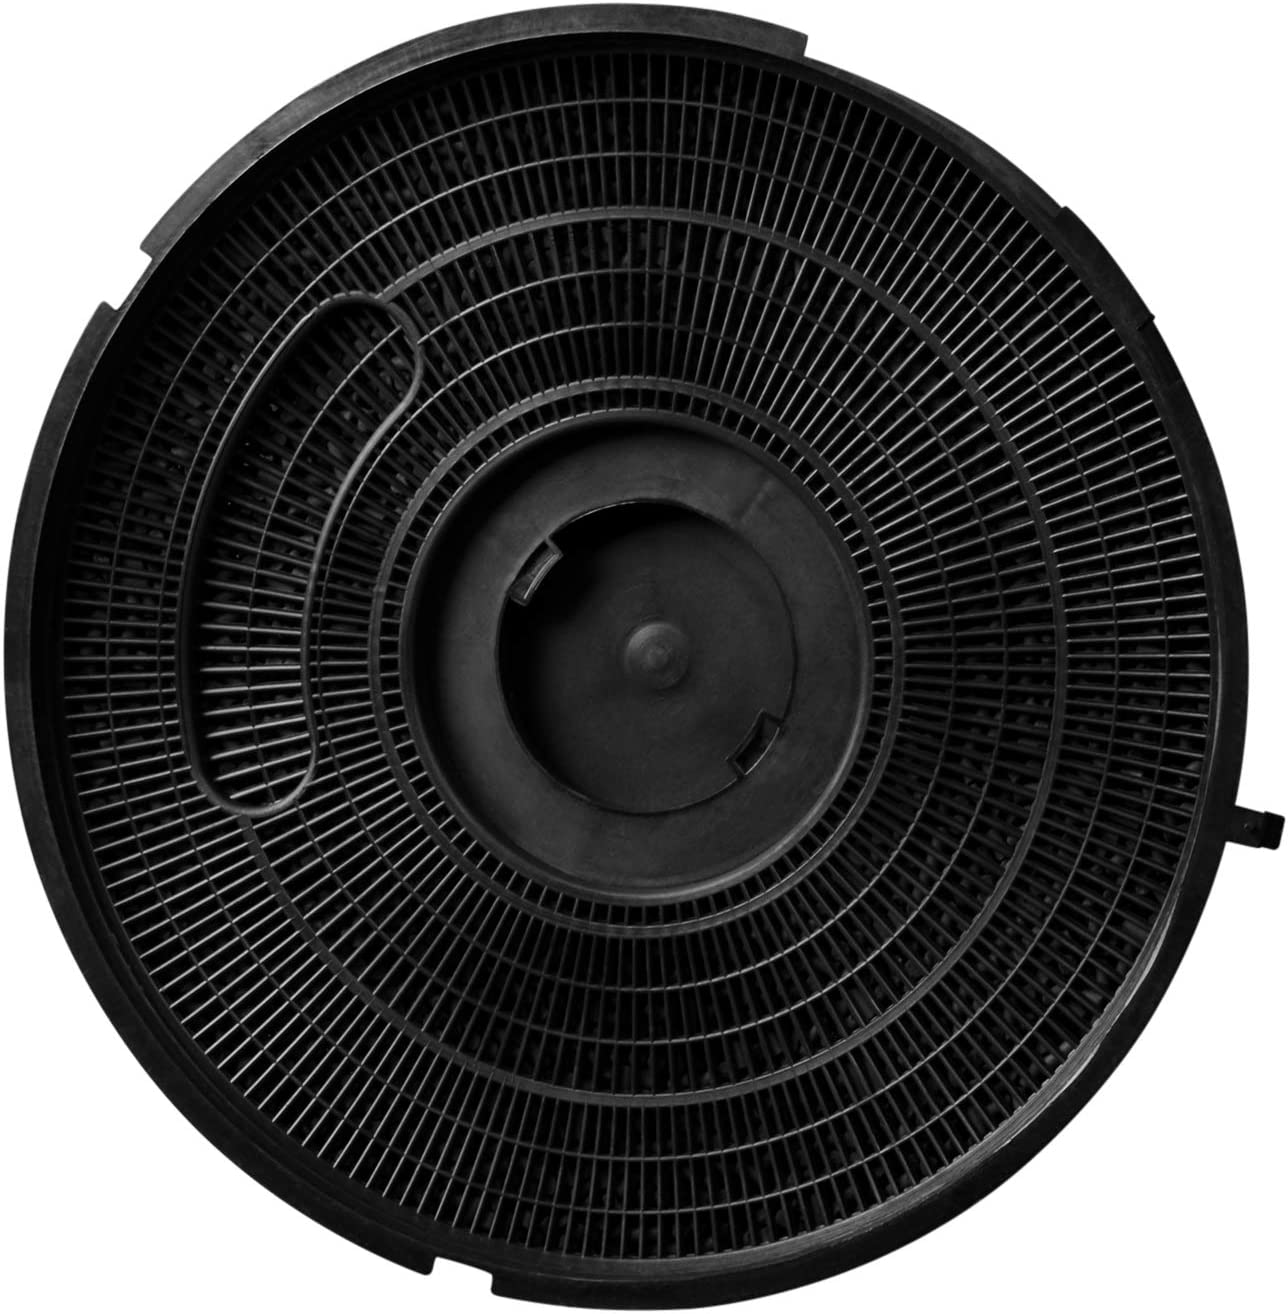 Filtro de carbón tipo 26 como Whirlpool 484000008789 de 280 mm de diámetro Wpro 481281718528 FAC269 Indesit C00385608 C00375086 para campana extractora AEG Bauknecht Elica